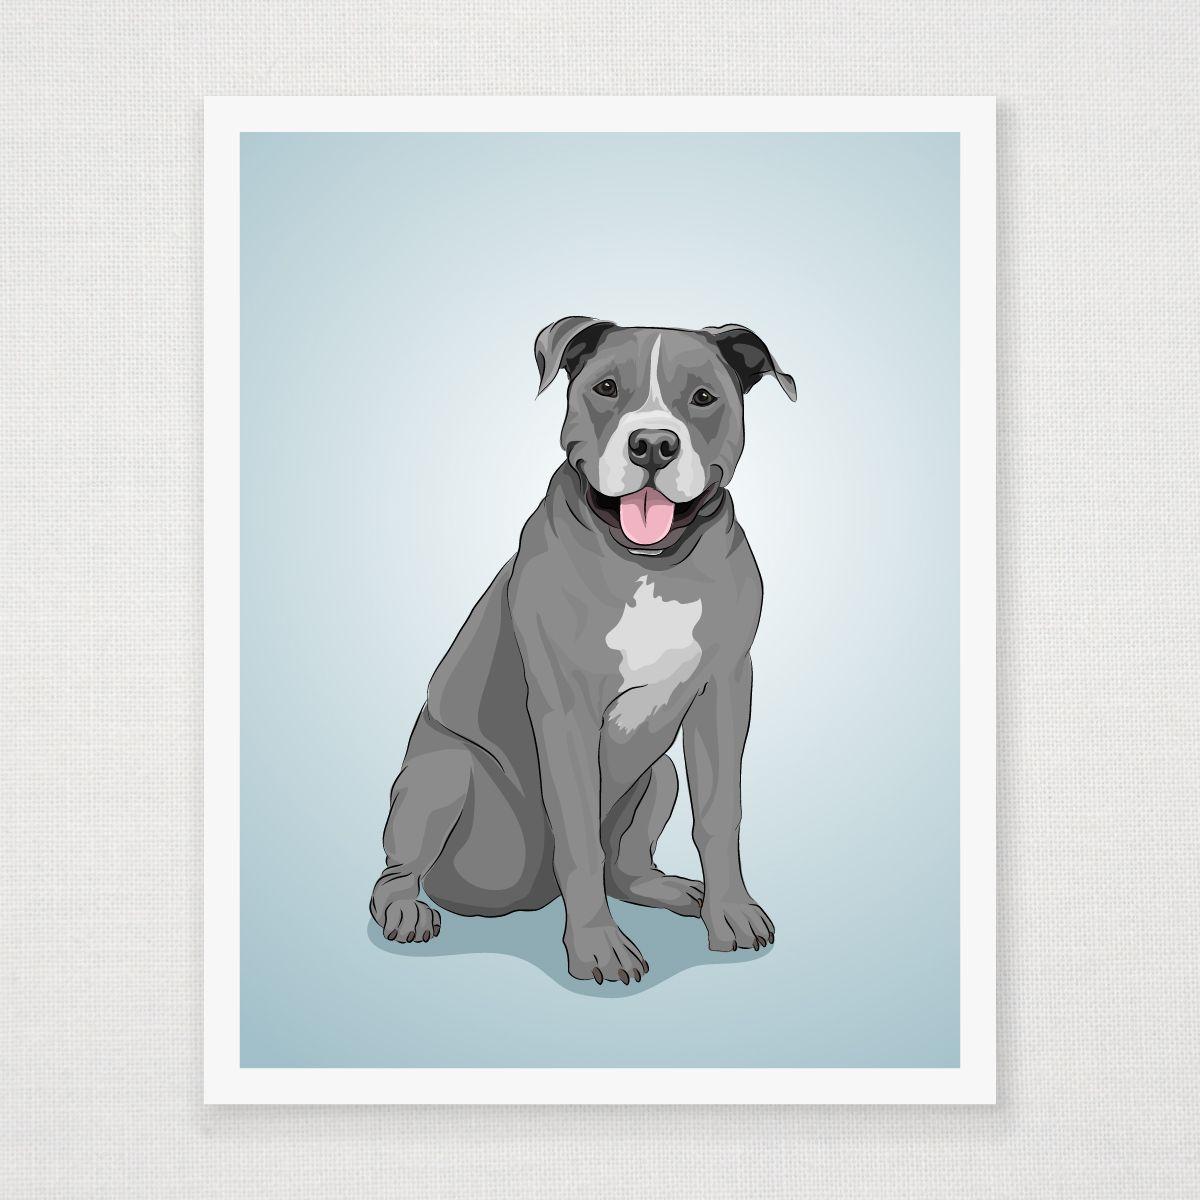 Picture It On Canvas Colorful Pitbull Graphic Art Pitbull Art